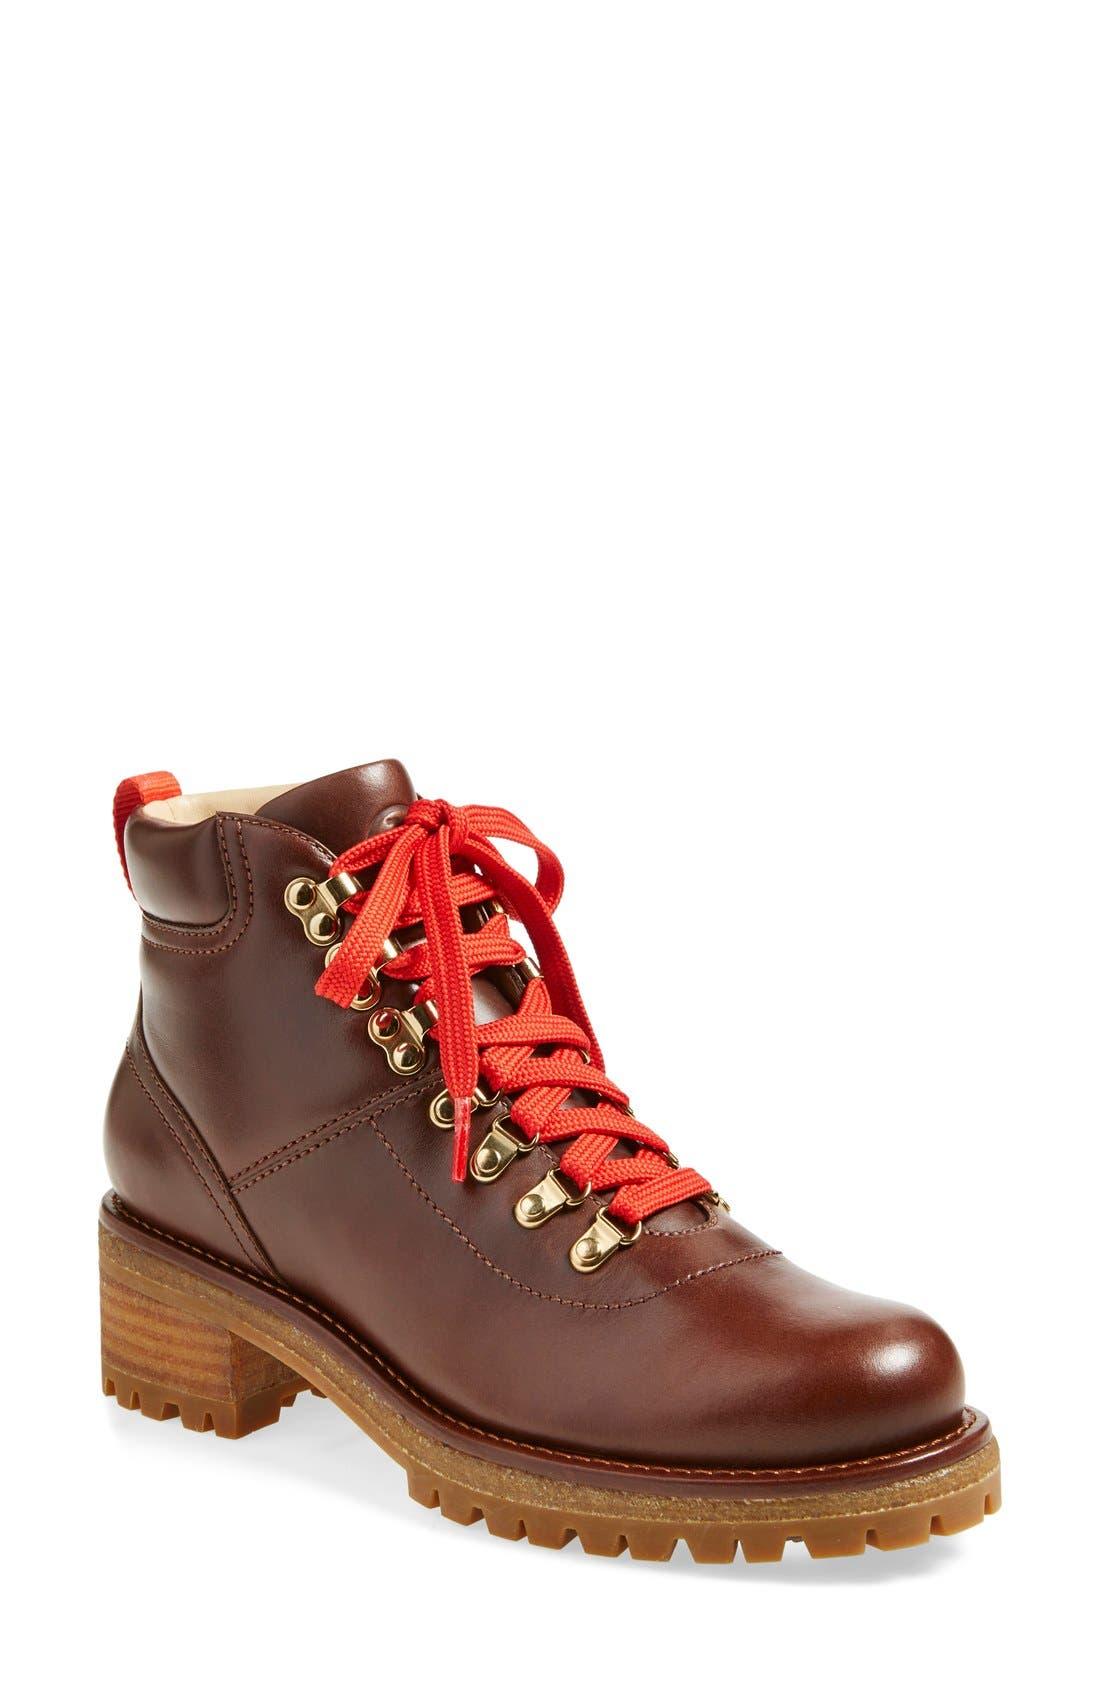 'Gunton' Ankle Hiking Boot, Main, color, 200